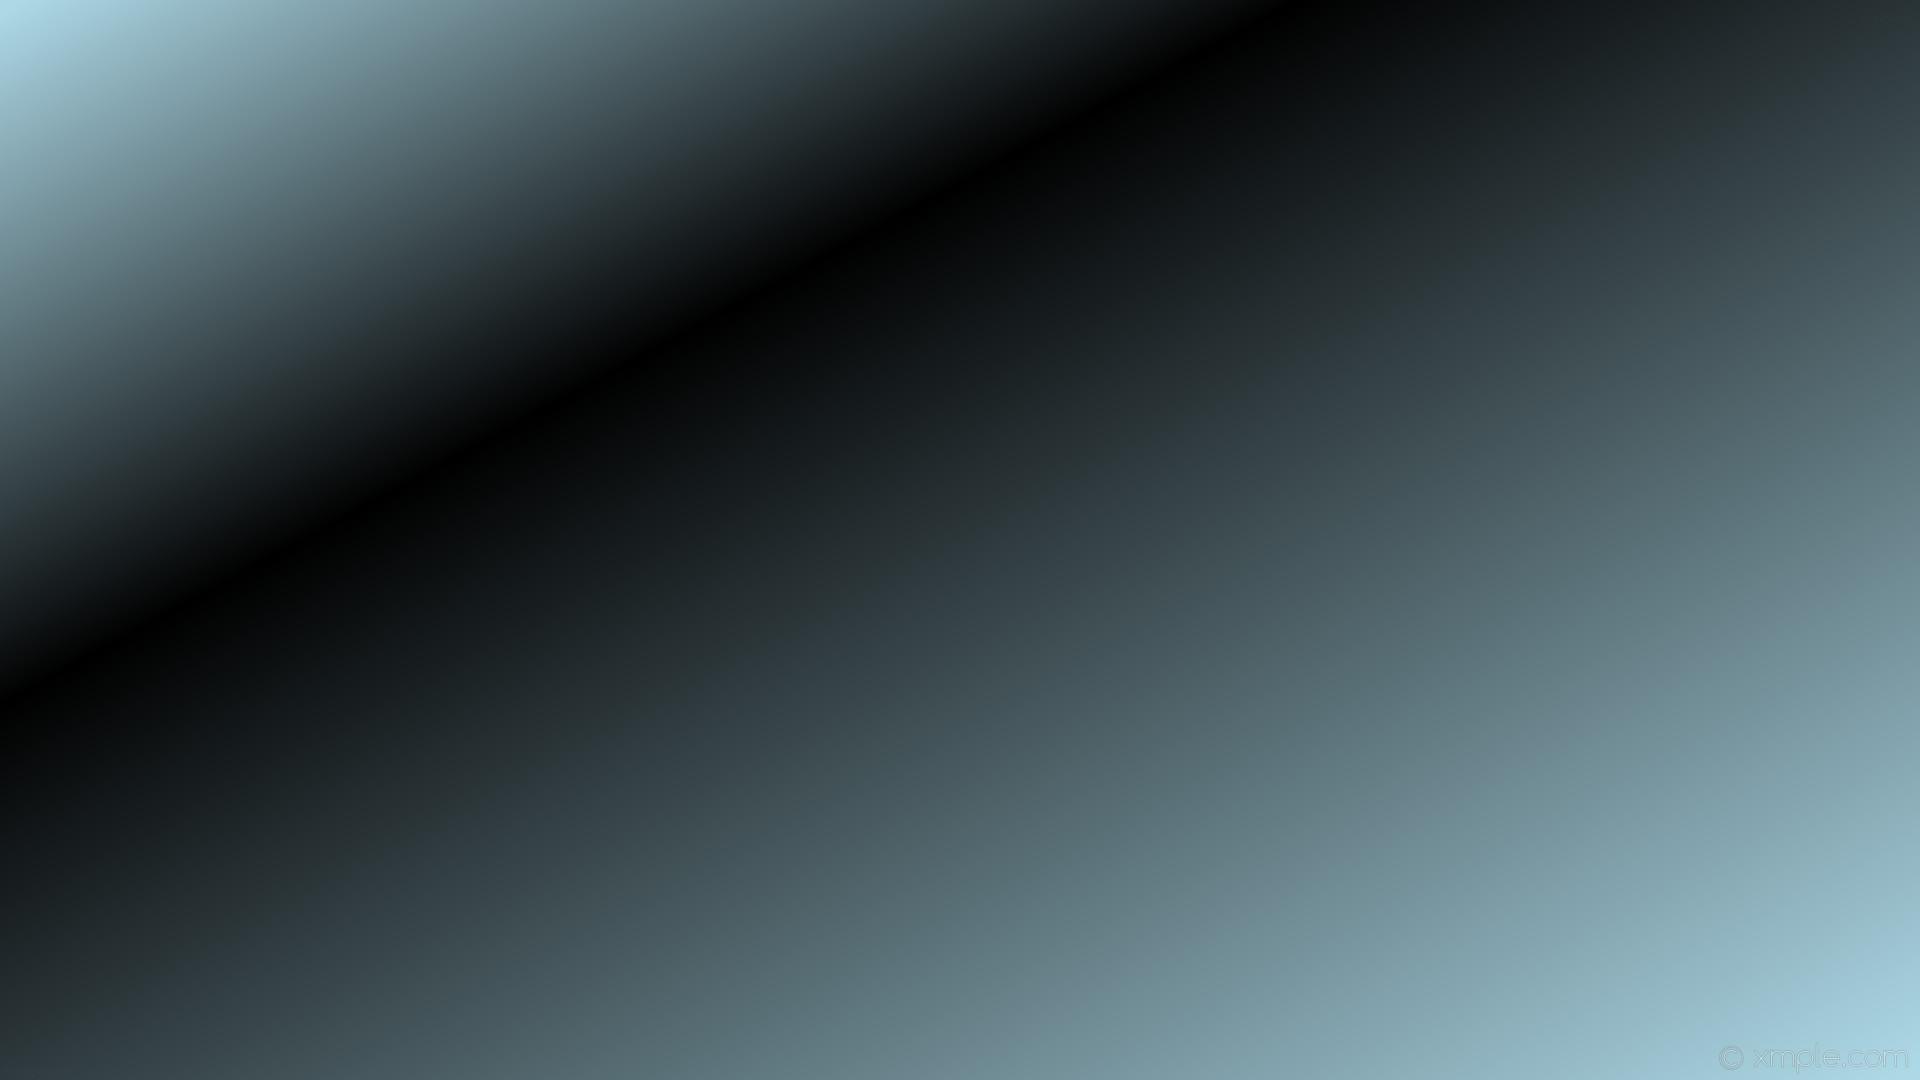 wallpaper linear blue black gradient highlight light blue #add8e6 #000000  330° 67%